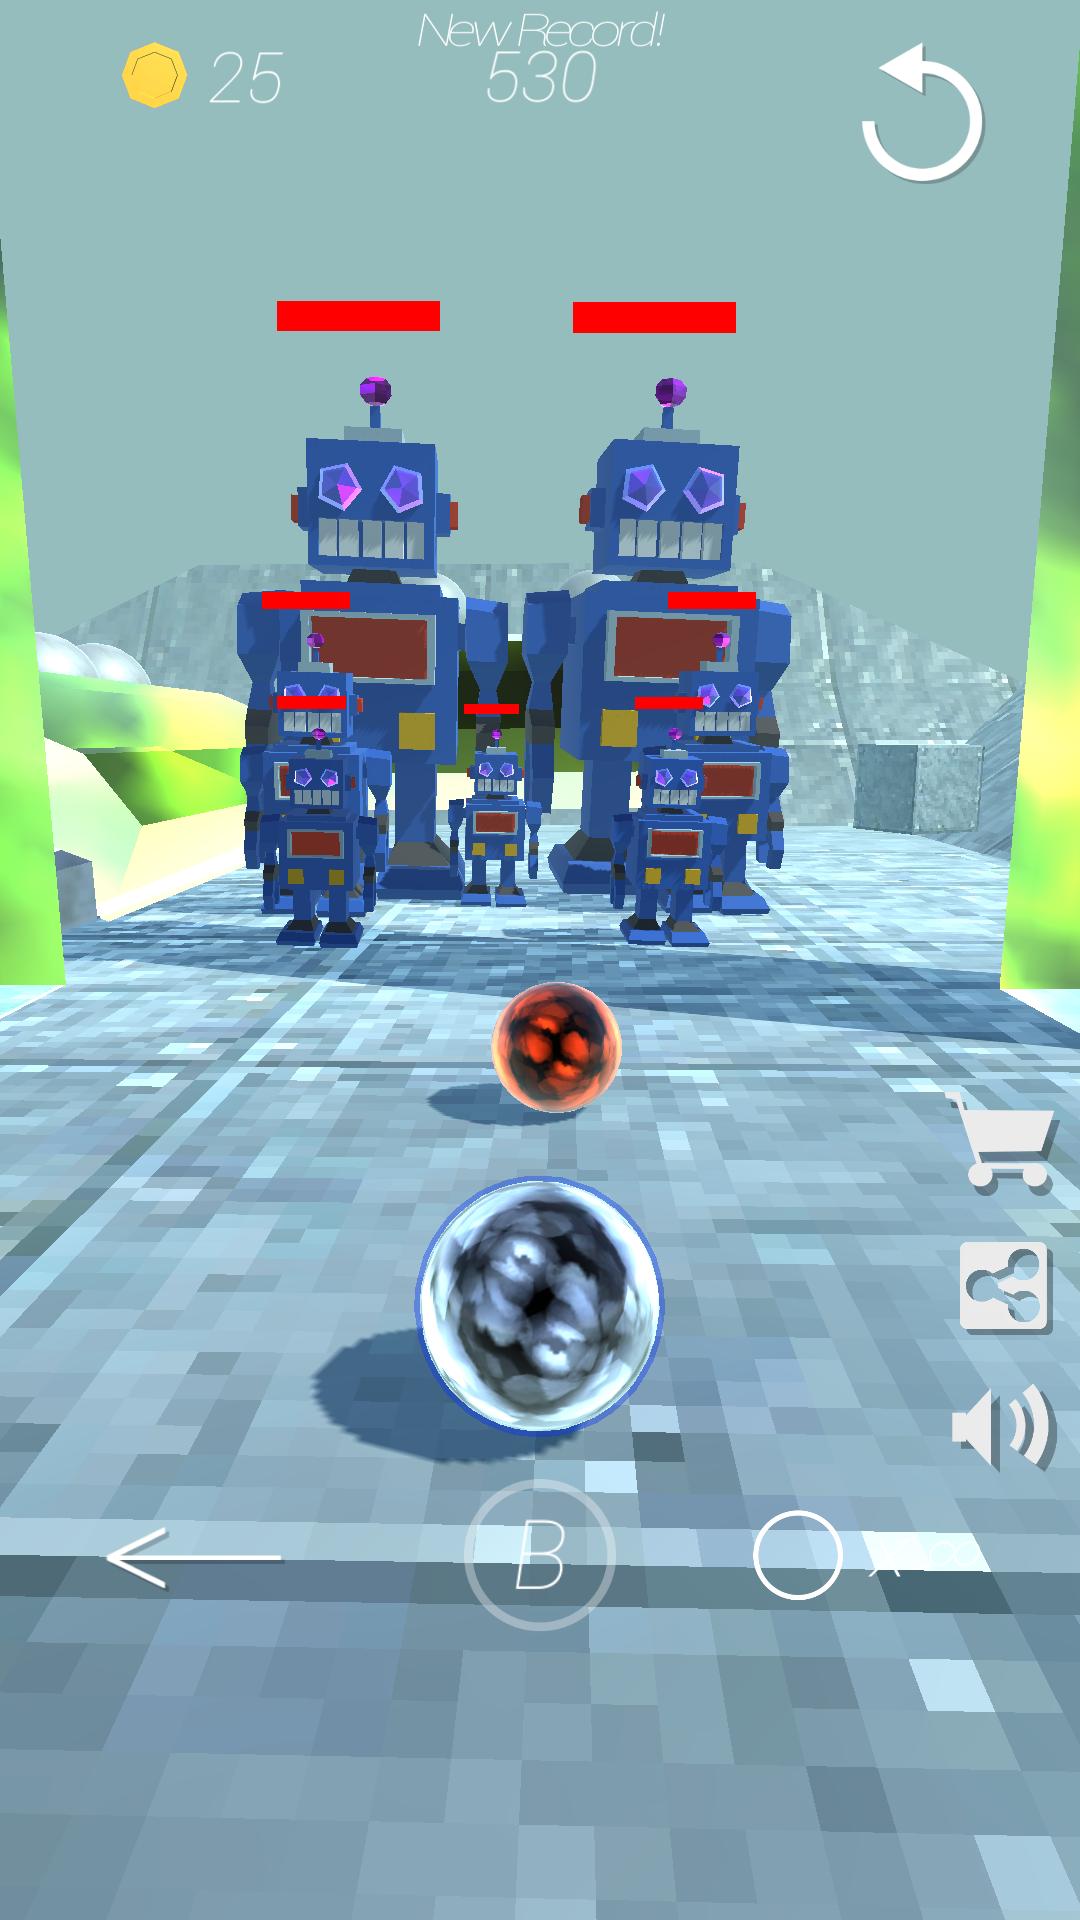 marbleZone robots